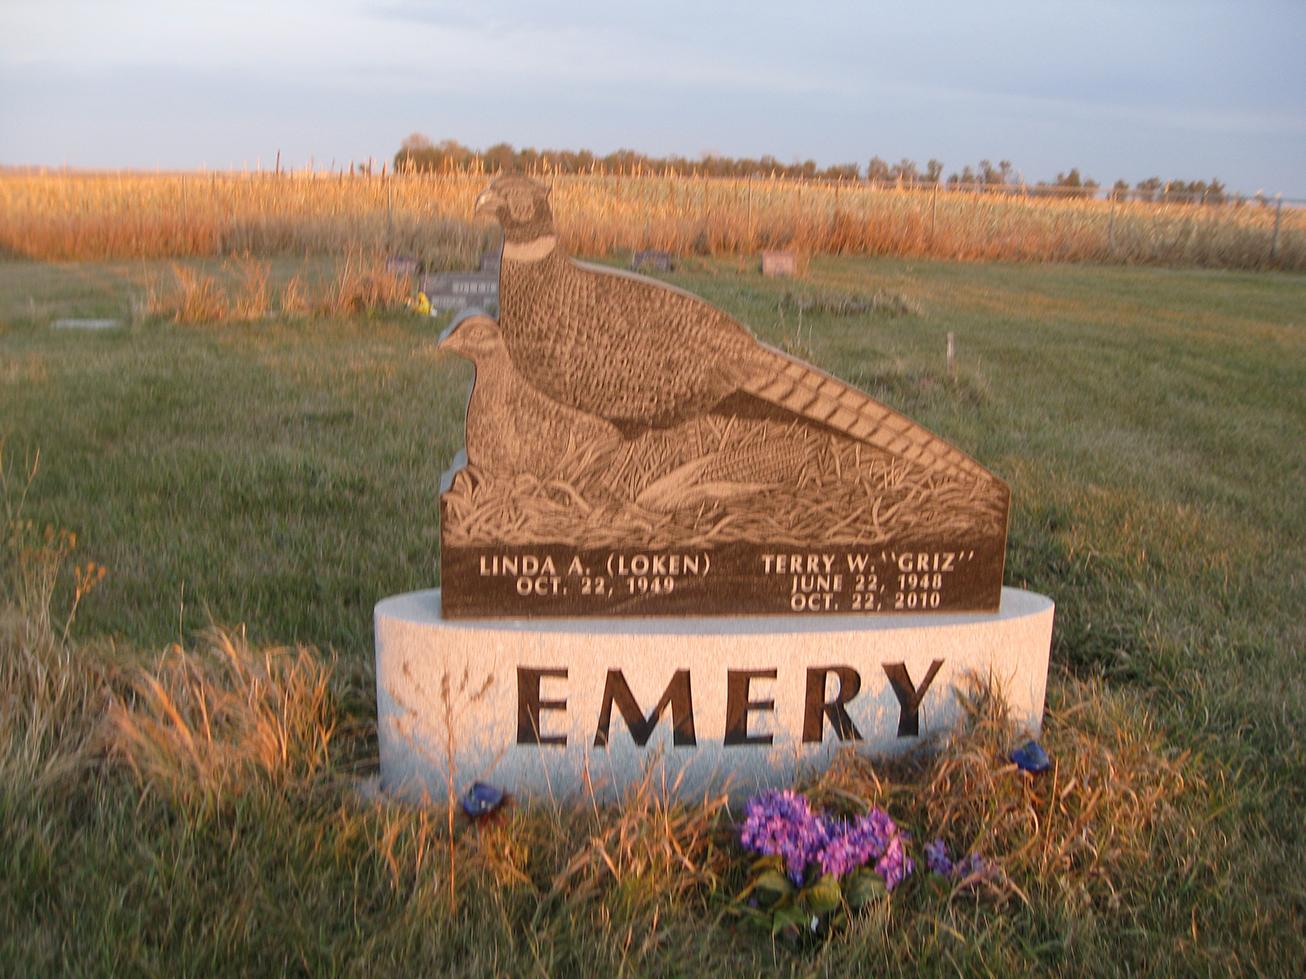 Emeryterry12 2